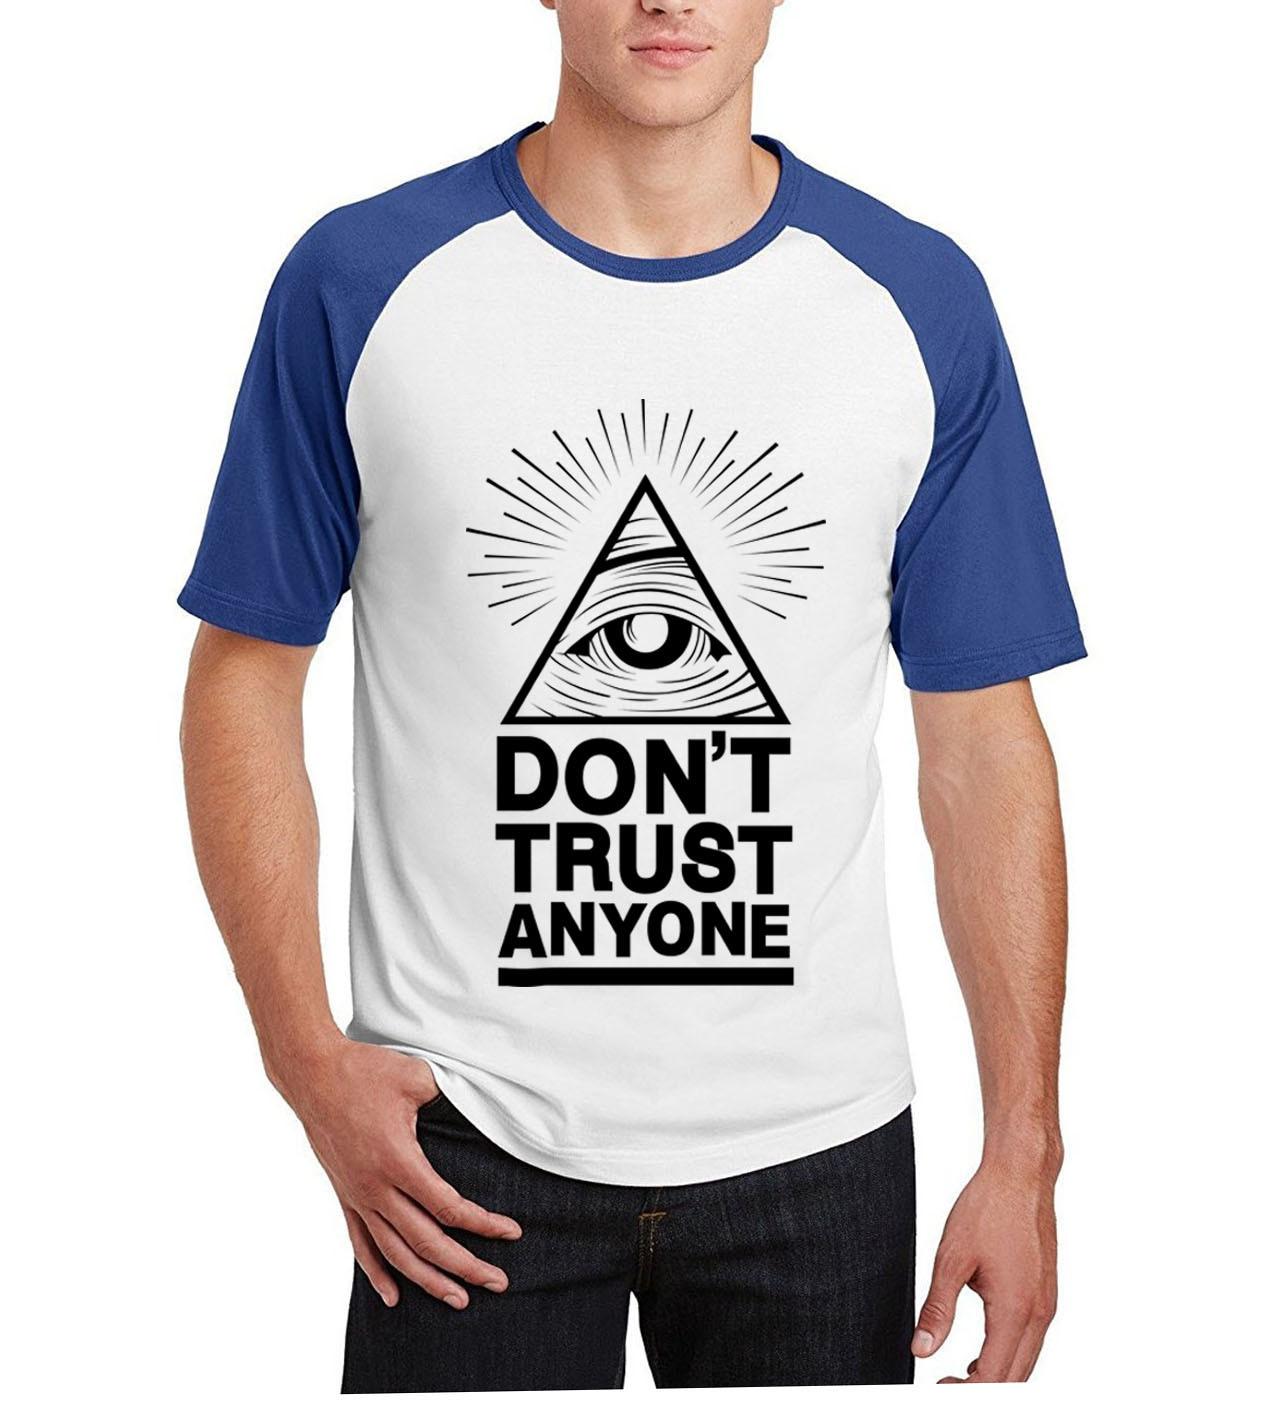 funny t shirt men Do not Trust Anyone  All Seeing Eye casual raglan short sleeve brand clothing 2019 summer cotton top